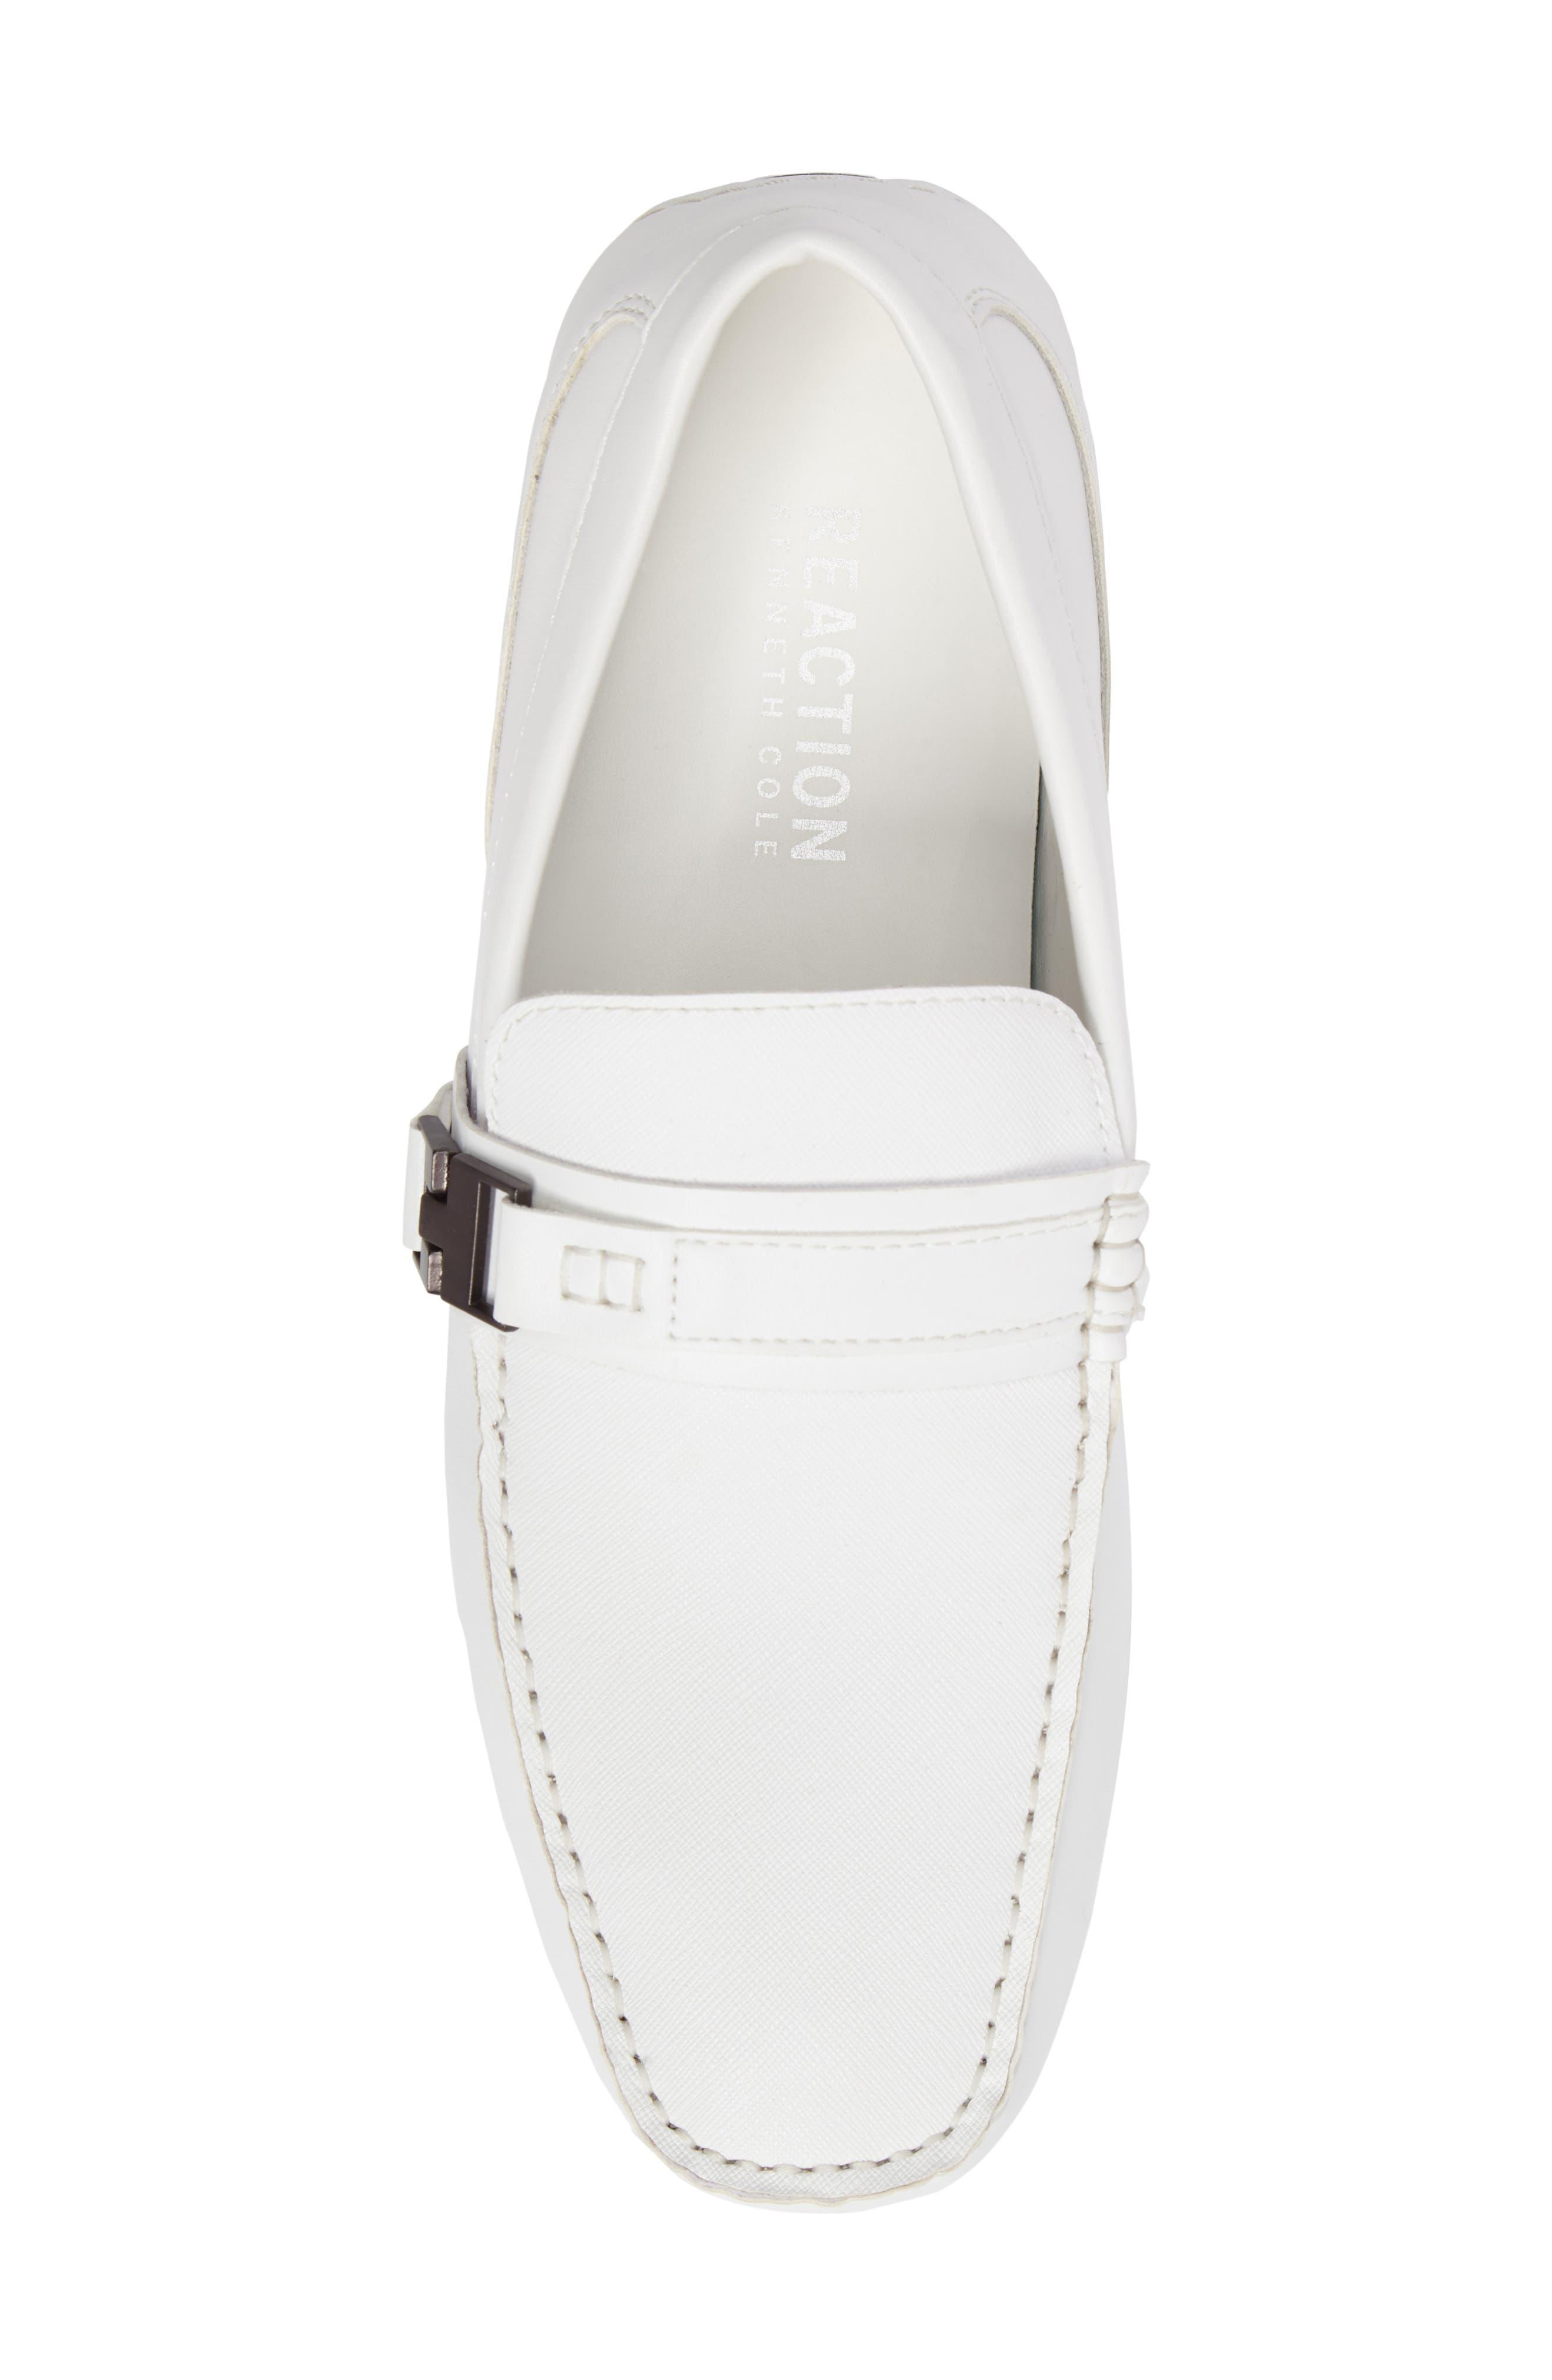 'Toast 2 Me' Driving Shoe,                             Alternate thumbnail 5, color,                             White Leather